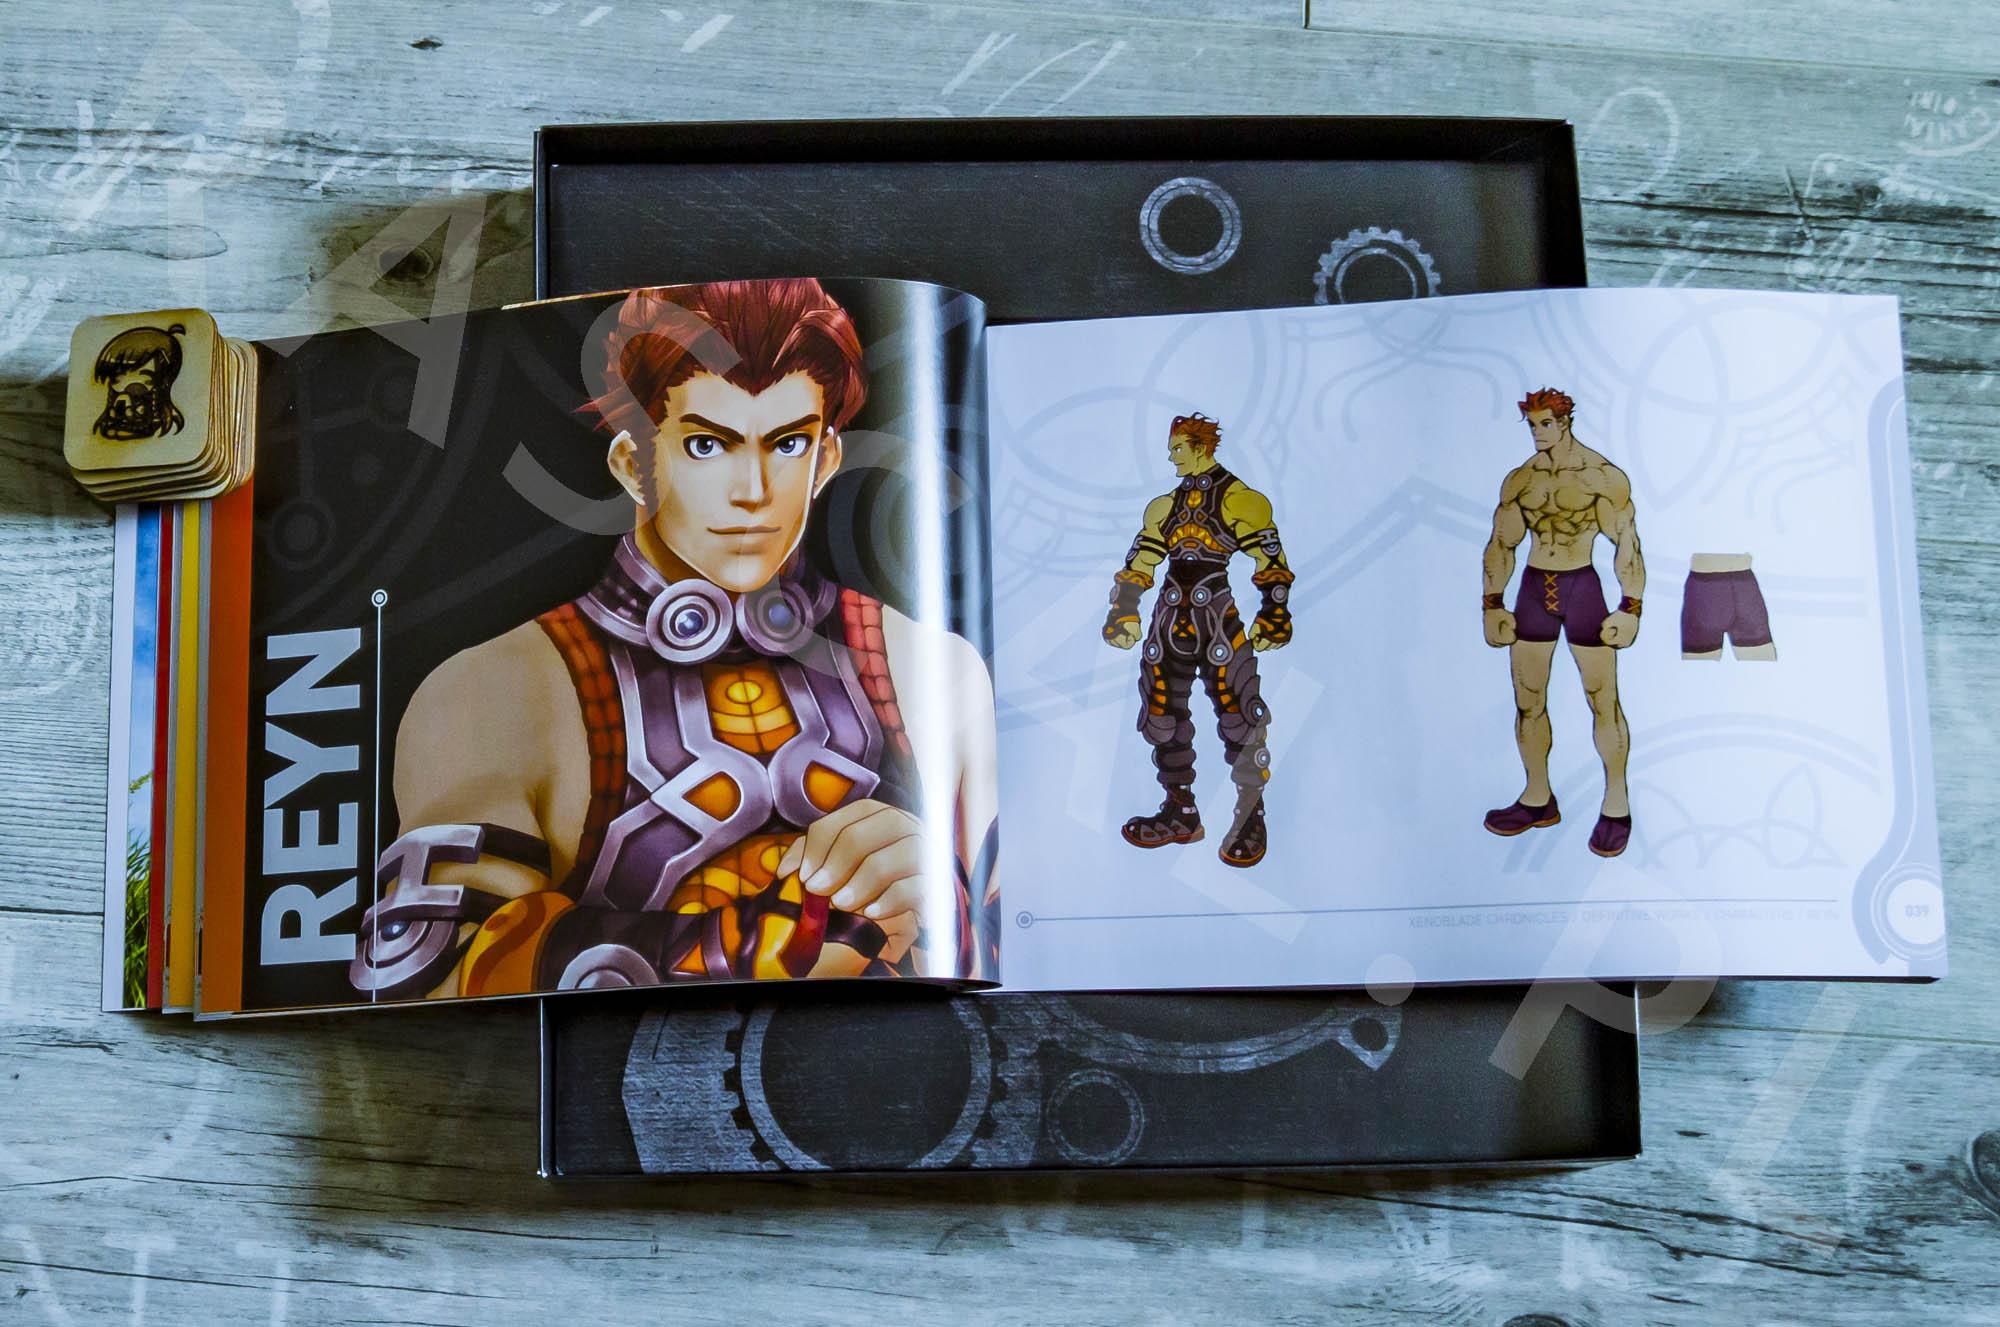 Xenoblade Chronicles Definitive Edition Collectors Set - Artbook - 05 - Reyn